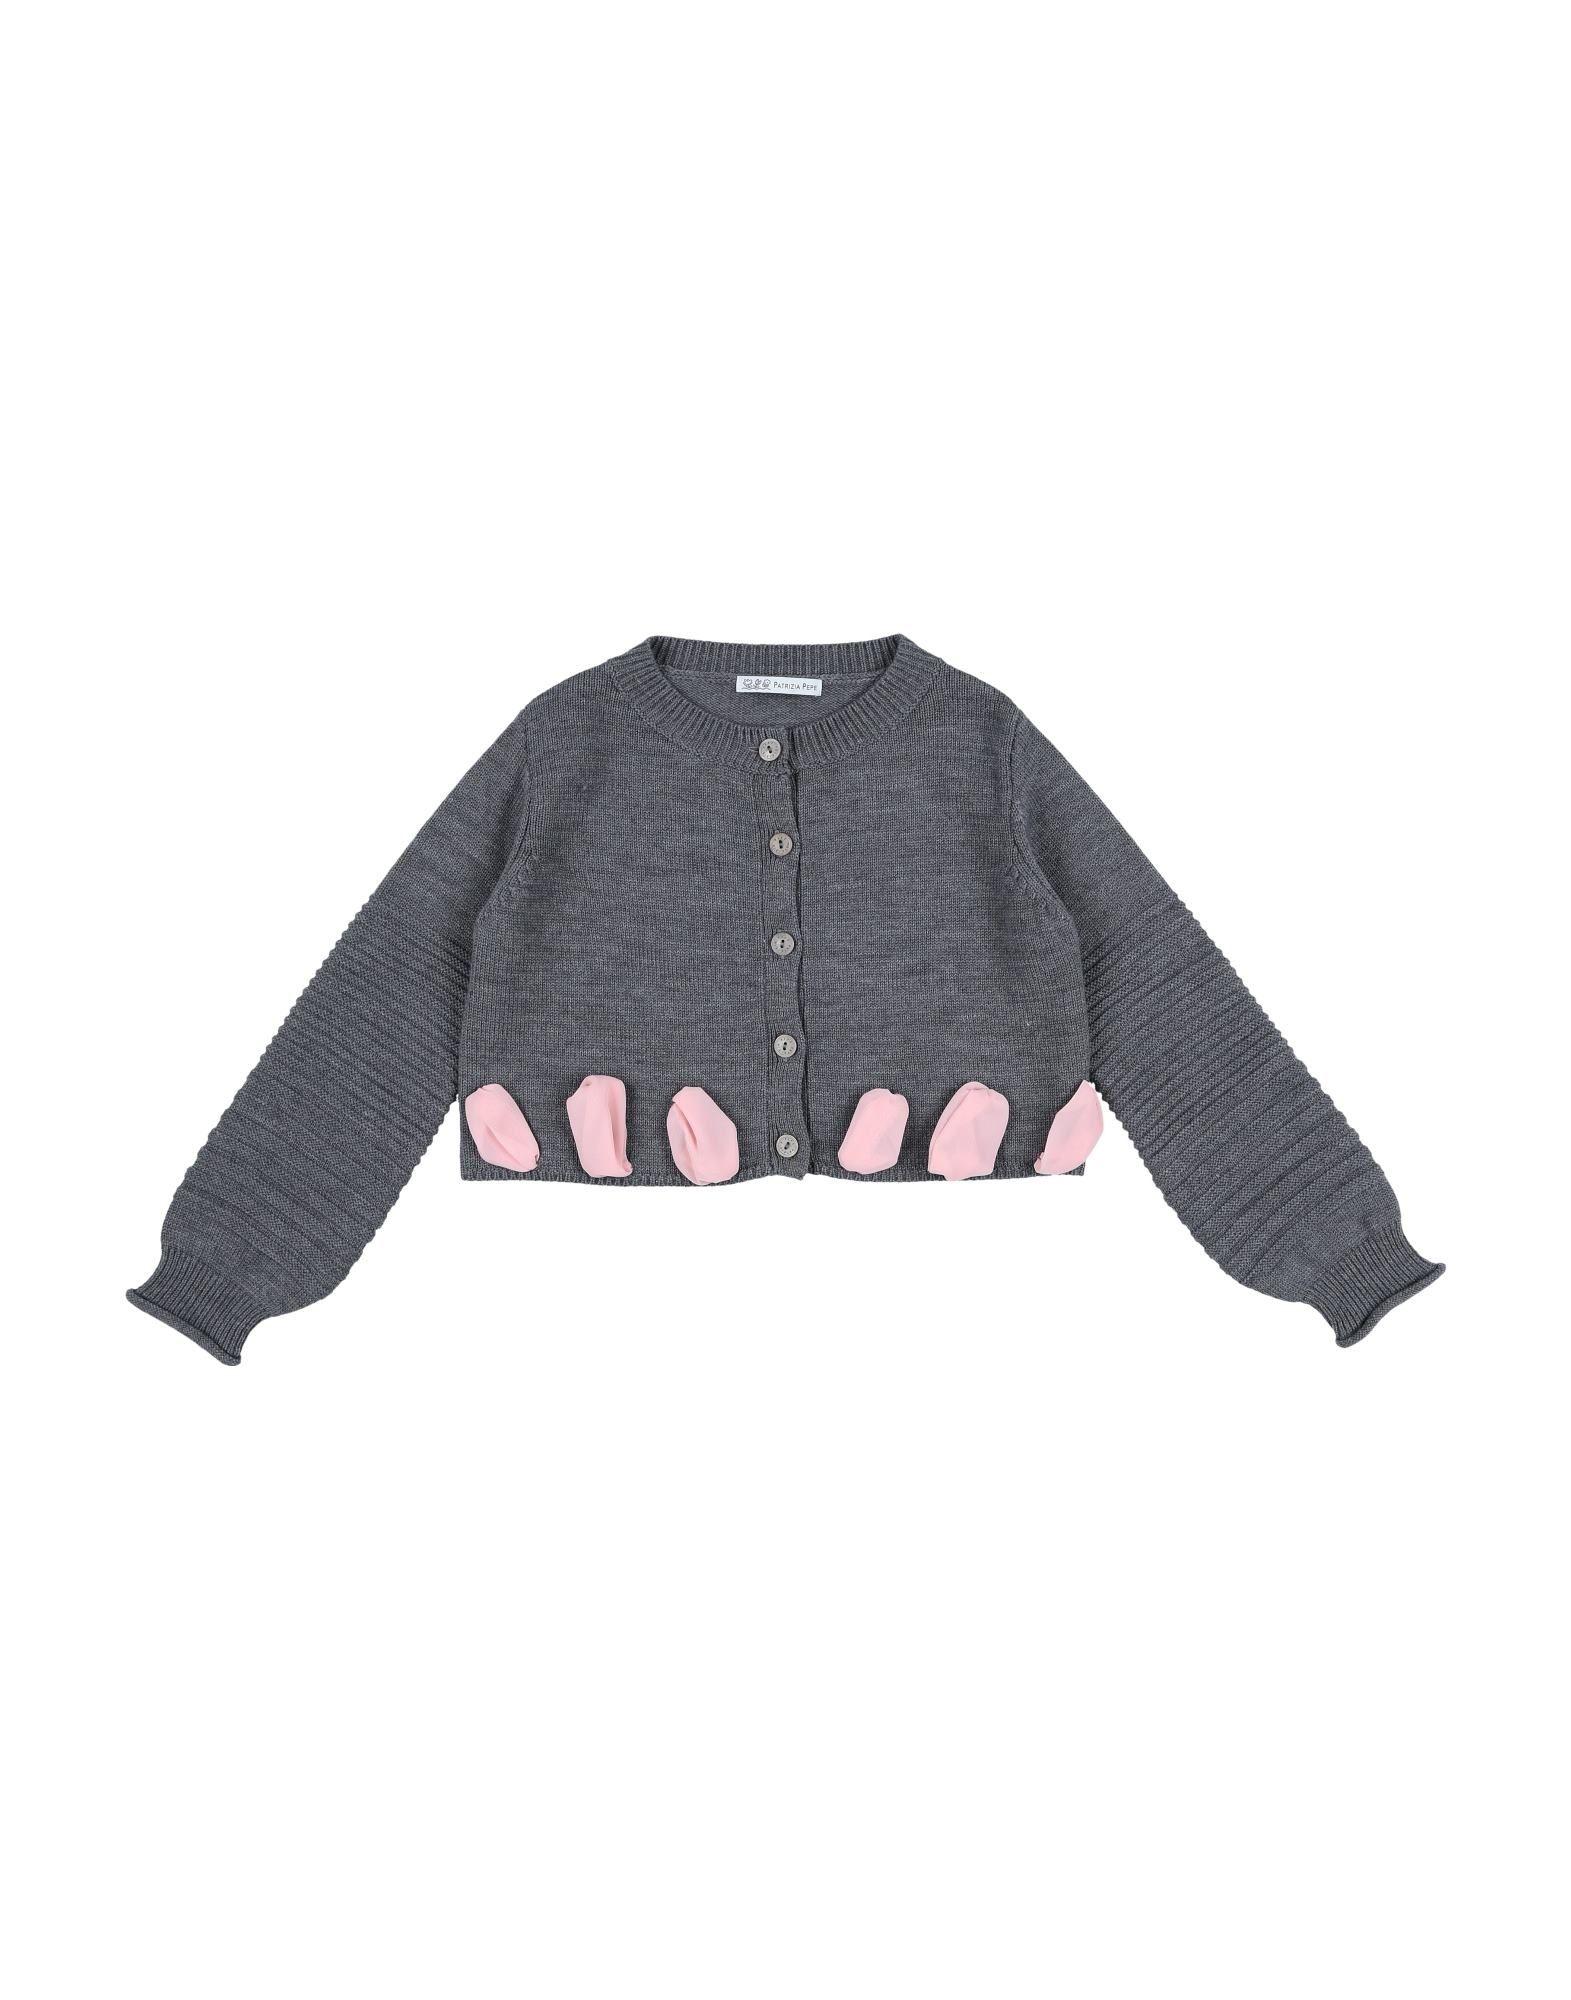 PATRIZIA PEPE | PATRIZIA PEPE Cardigans 39956883 | Goxip